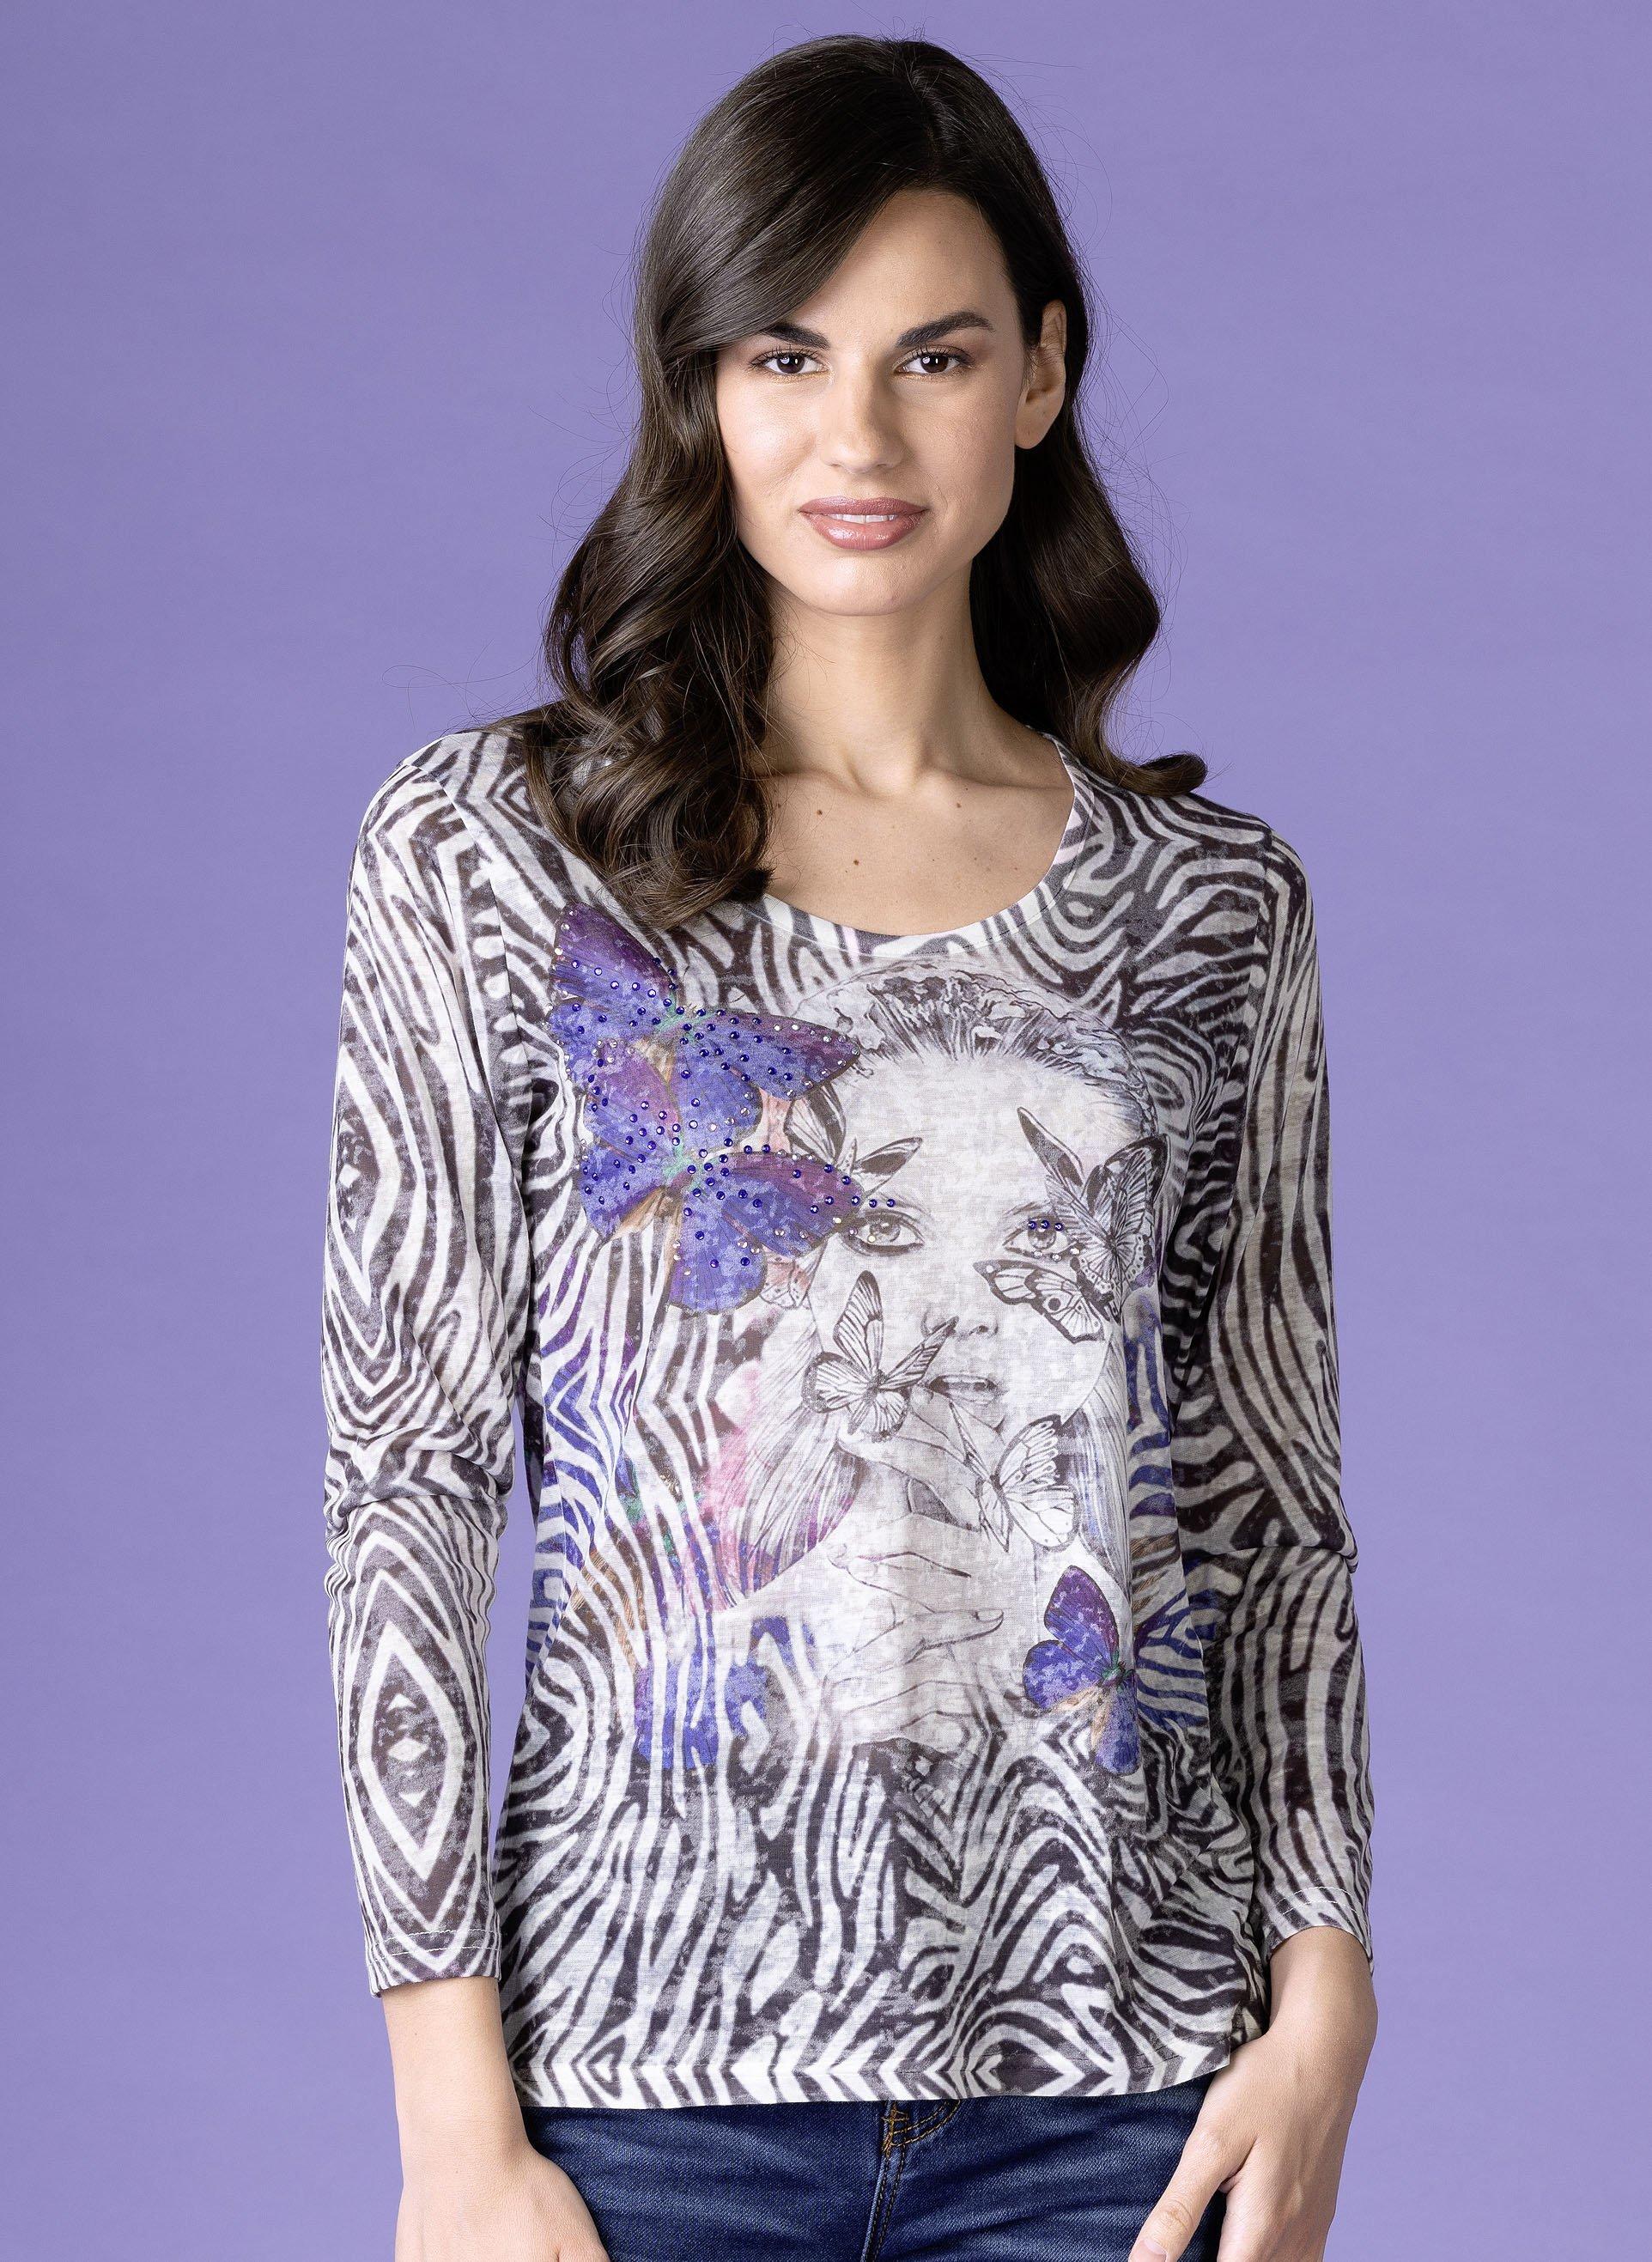 D-LA-Shirt,Girl/Schmetterling L 058 - 1 - Ronja.ch